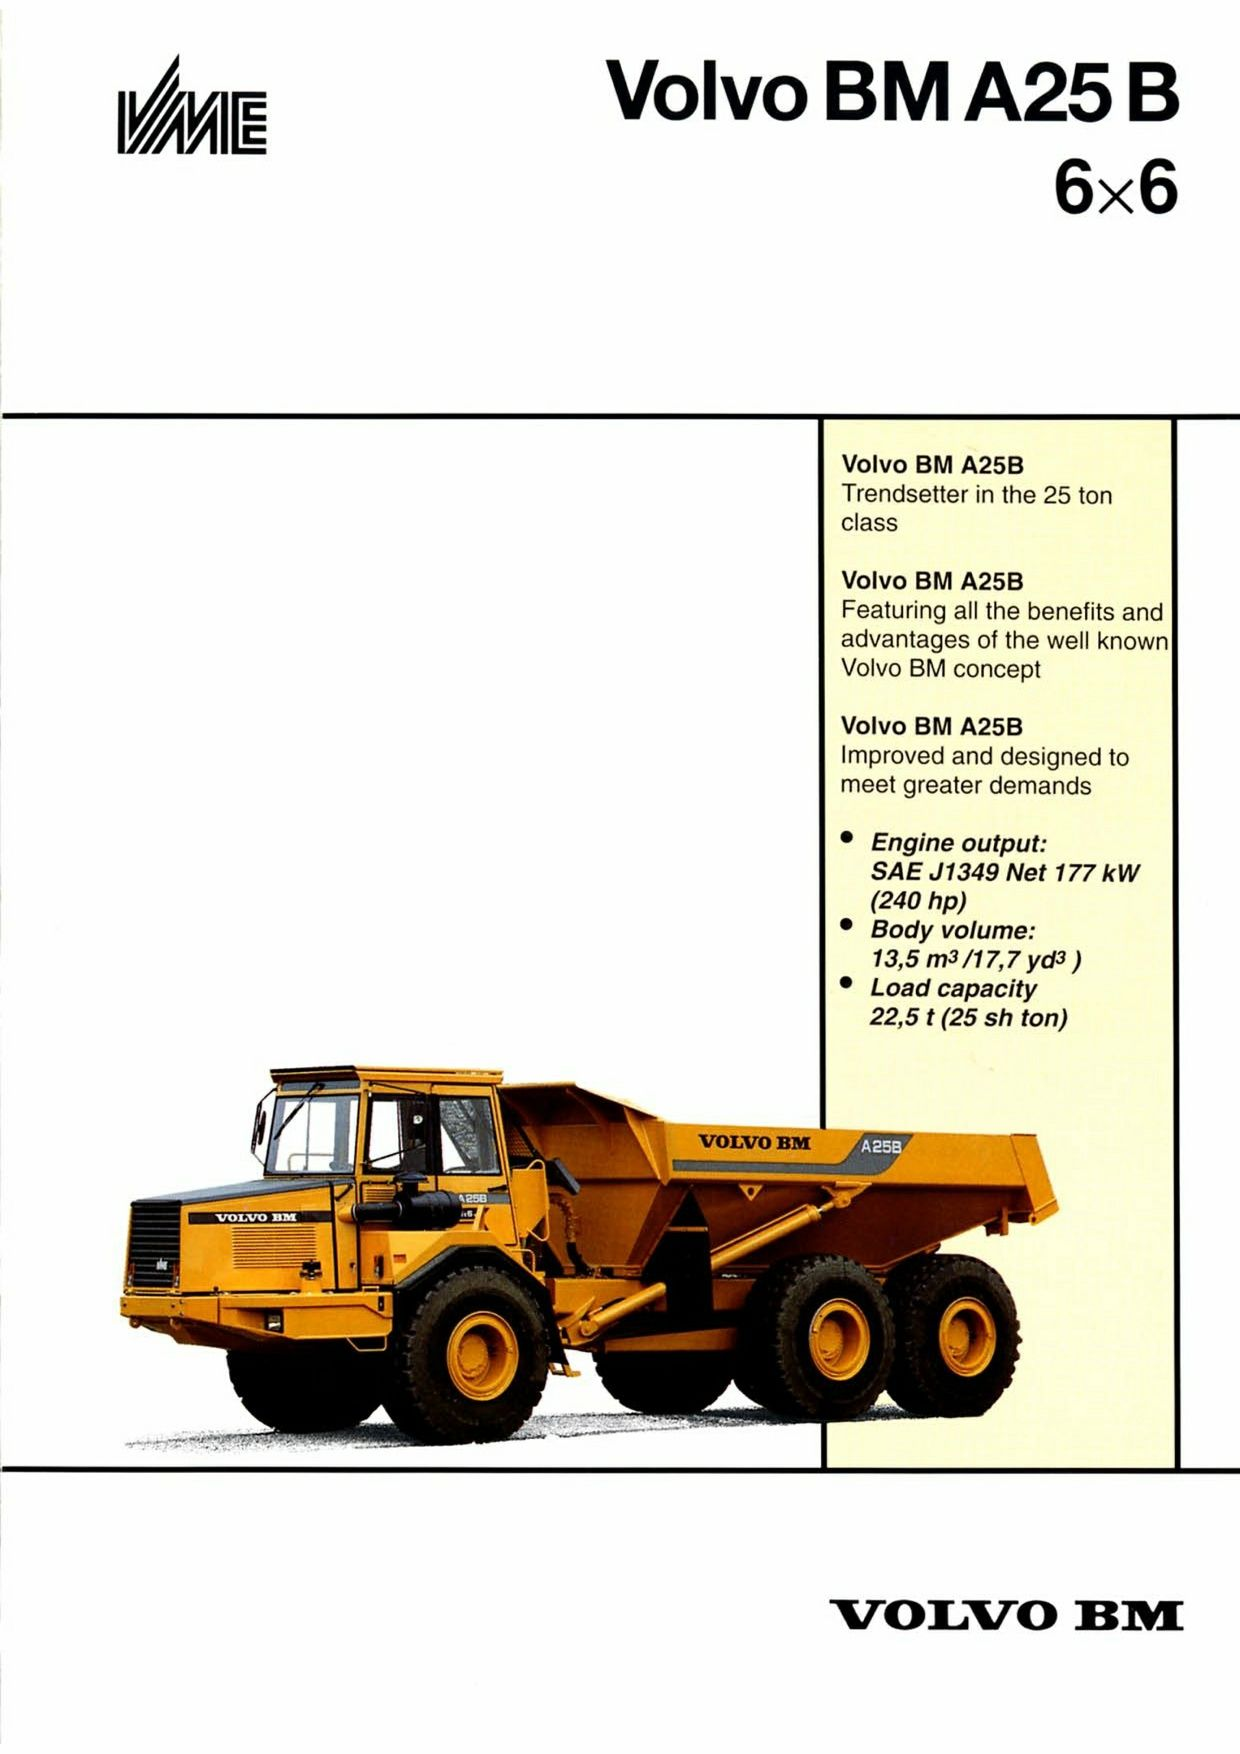 pdf download volvo bm a25b articulated hauler repair service manual rh pinterest com heavy equipment manuals wanted heavy equipment manuals used to buy